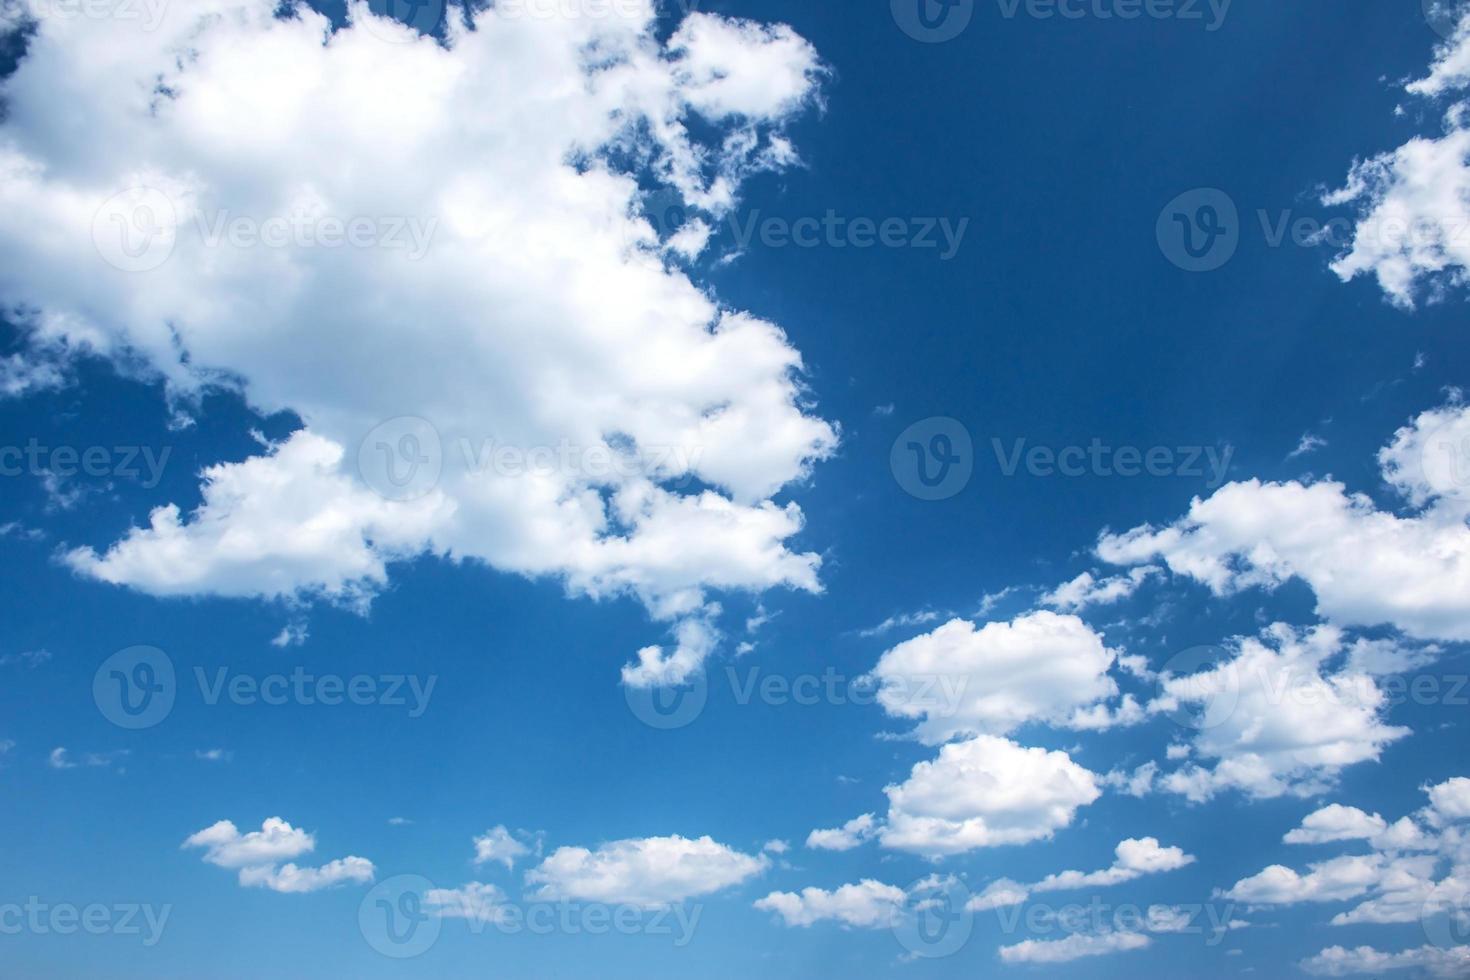 flauschige Wolken am blauen Himmel foto